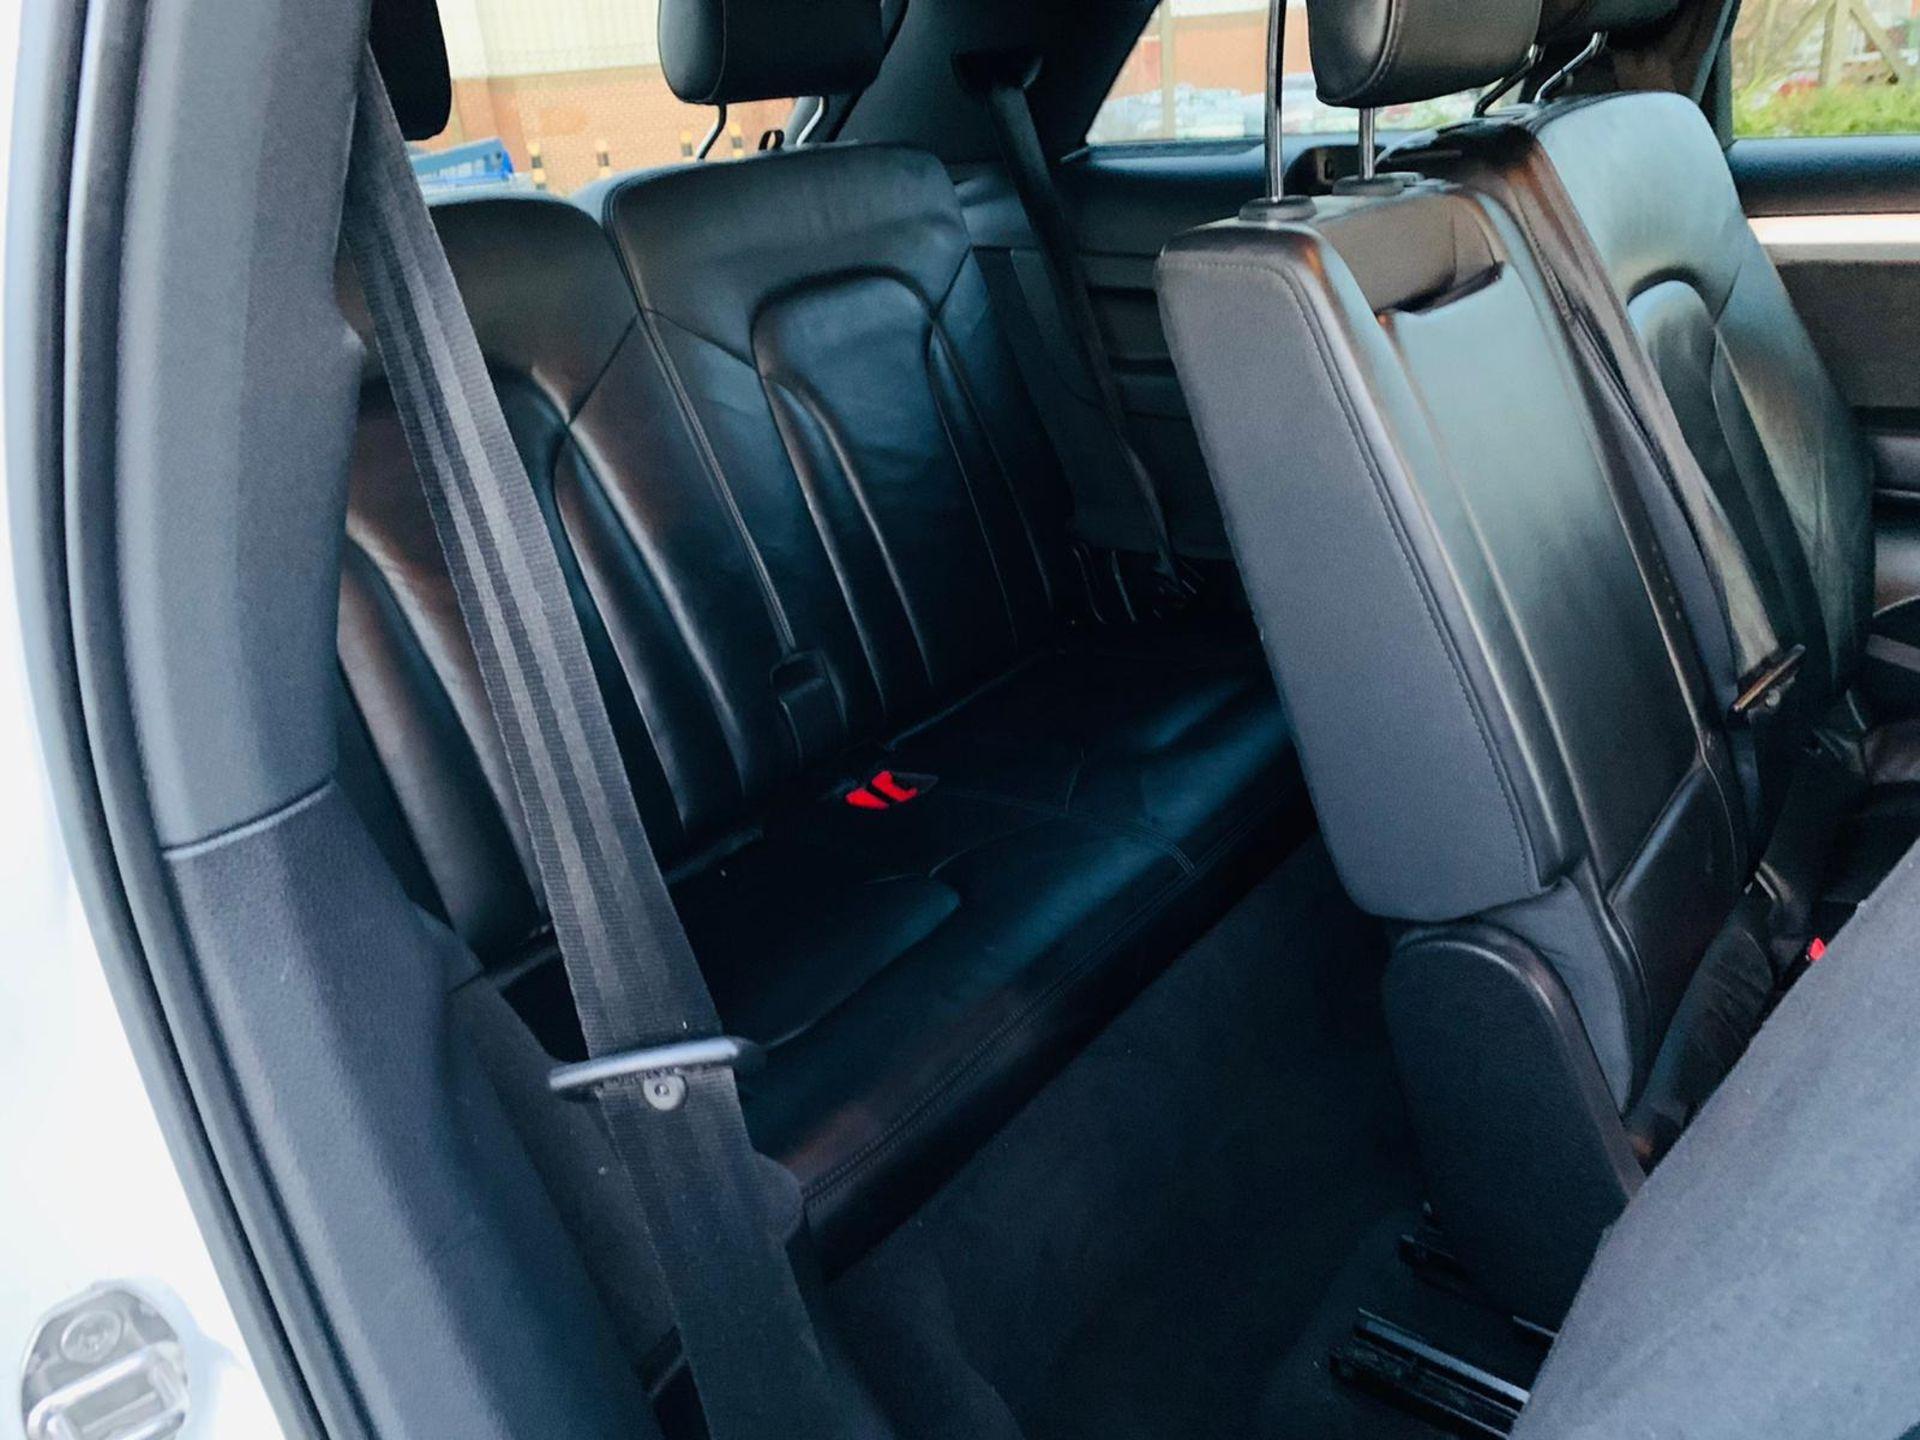 (Reserve Met)Audi Q7 3.0 TDI Quattro S Line Plus Auto (7 Seats) - 12 Reg - Only 63k Miles -Sat Nav- - Image 14 of 37